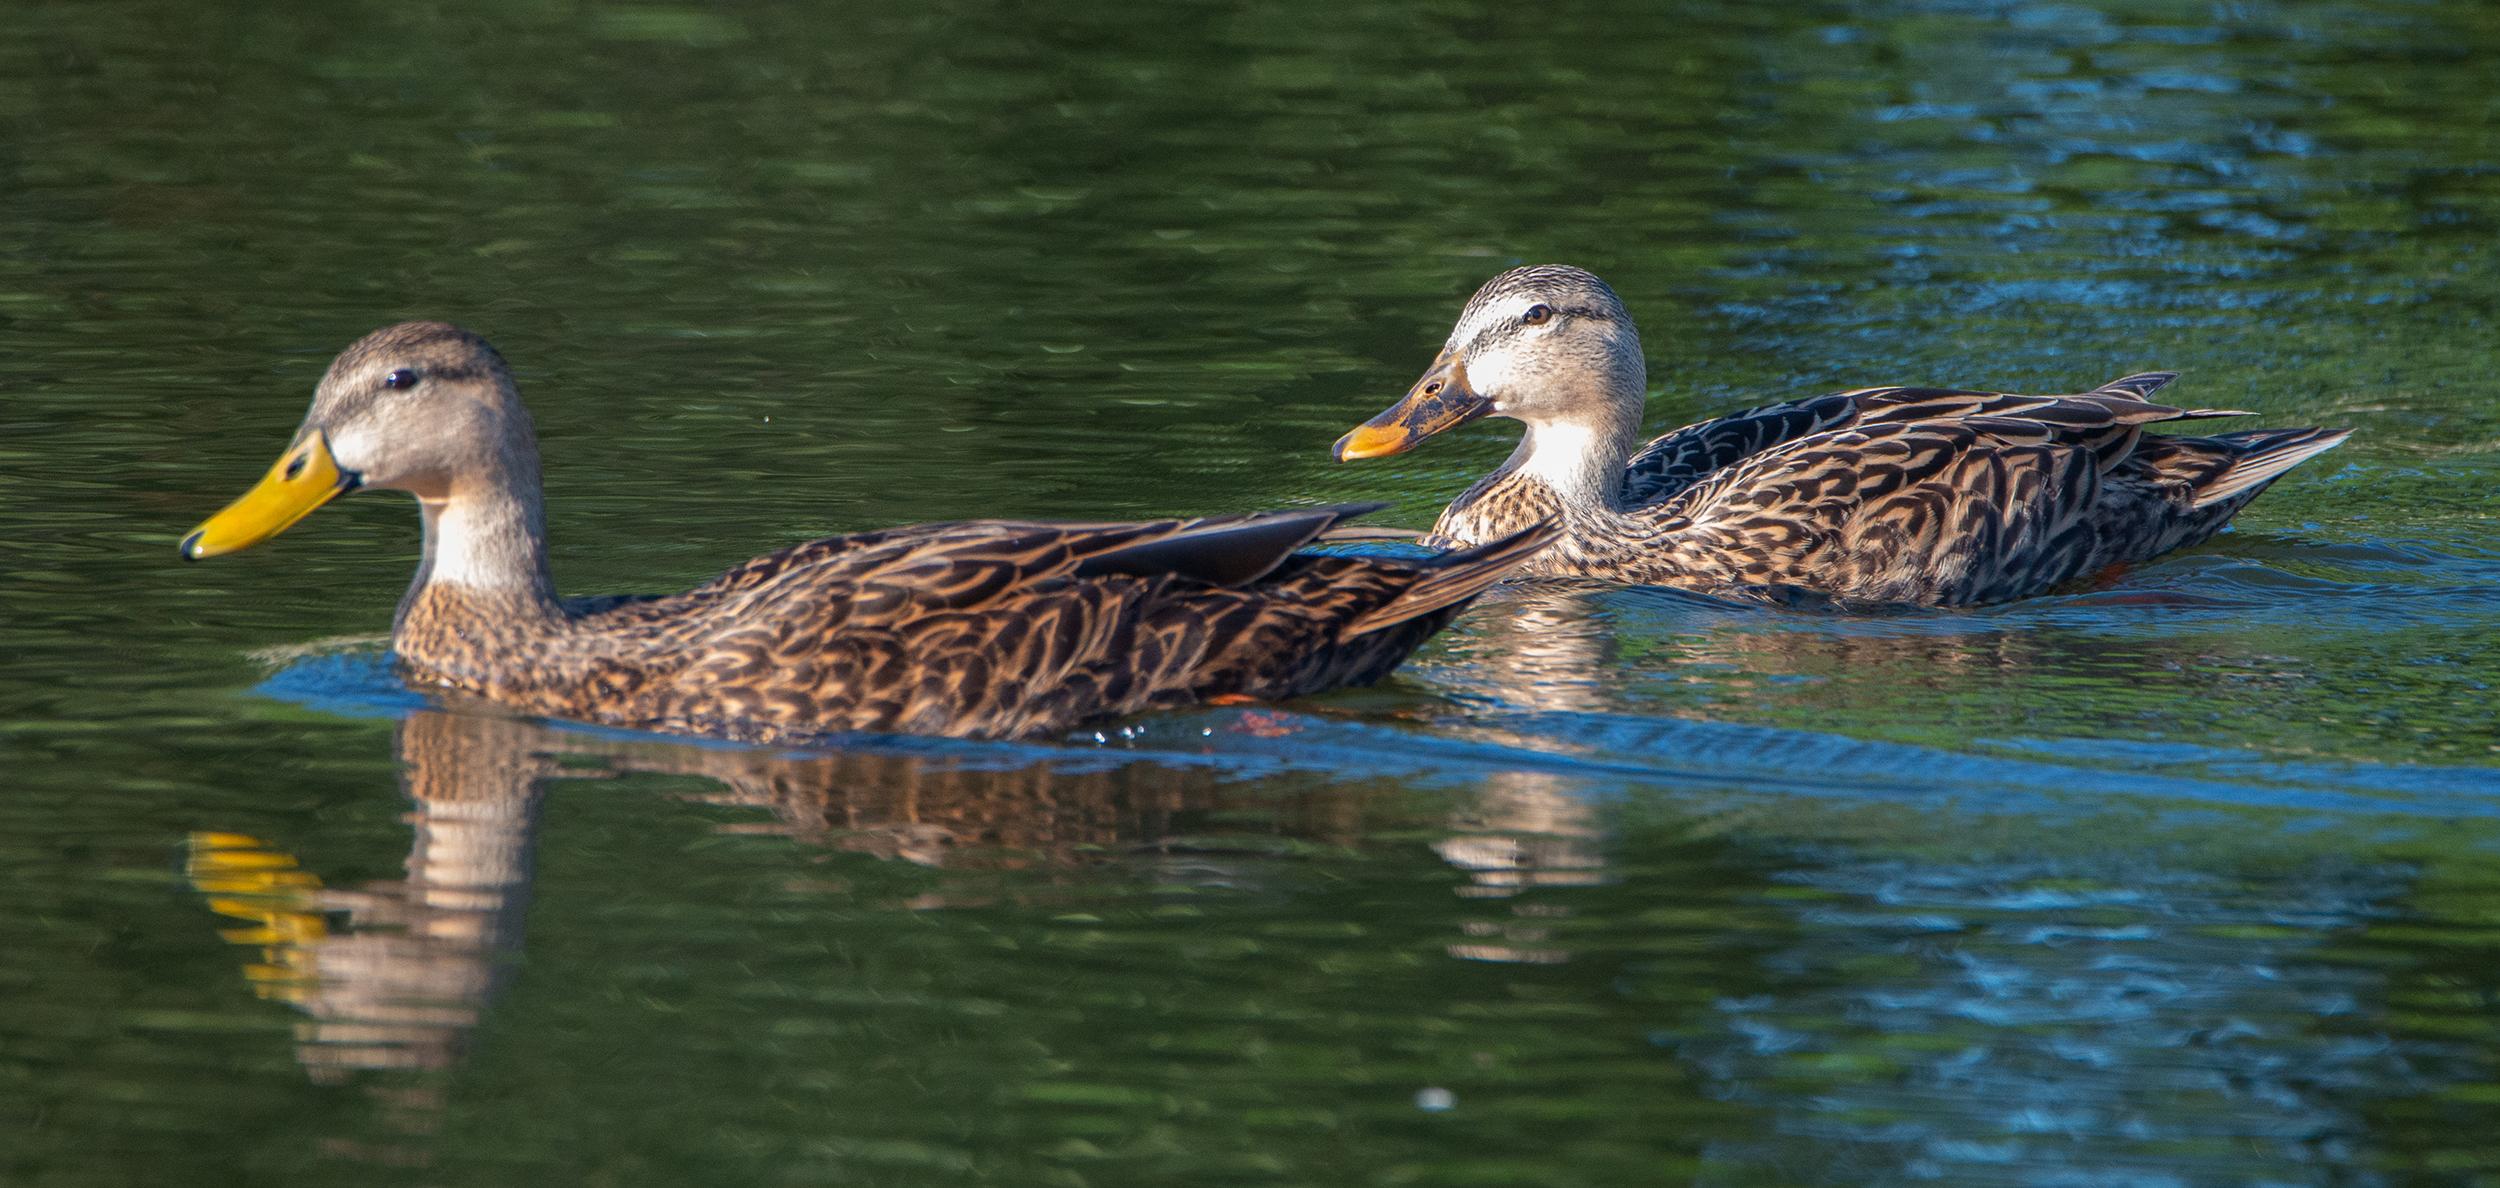 #mallard, #ducks, #lake, #color, #swimming, #pair, #female